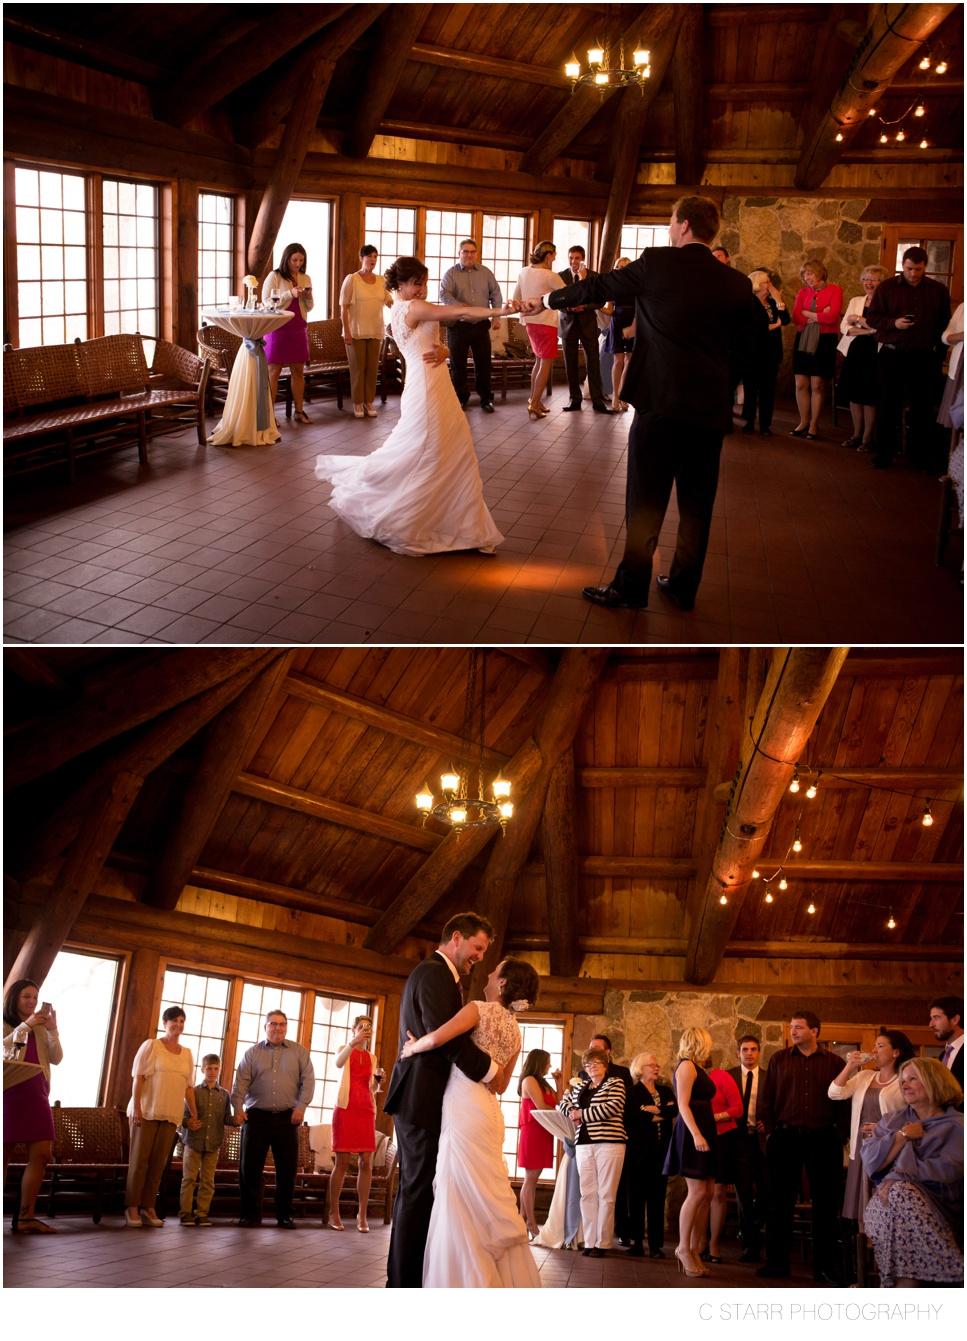 Location €� Okoboji Iowa: Okoboji Iowa Wedding Venues At Reisefeber.org